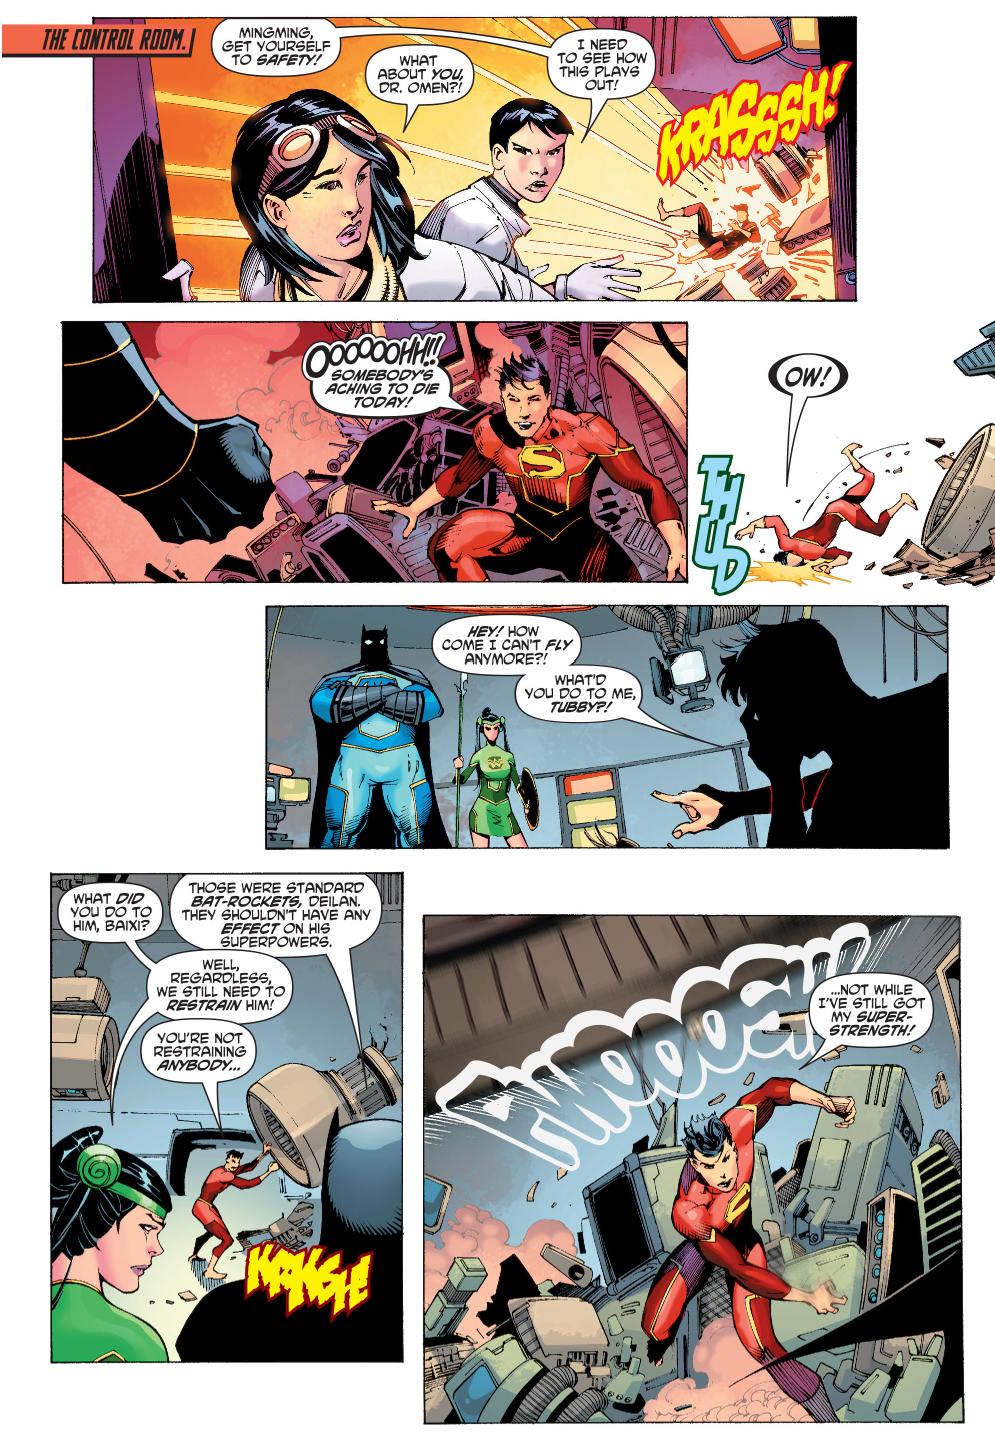 Chinese Super-Man VS Chinese Bat-Man And Chinese Wonder-Woman